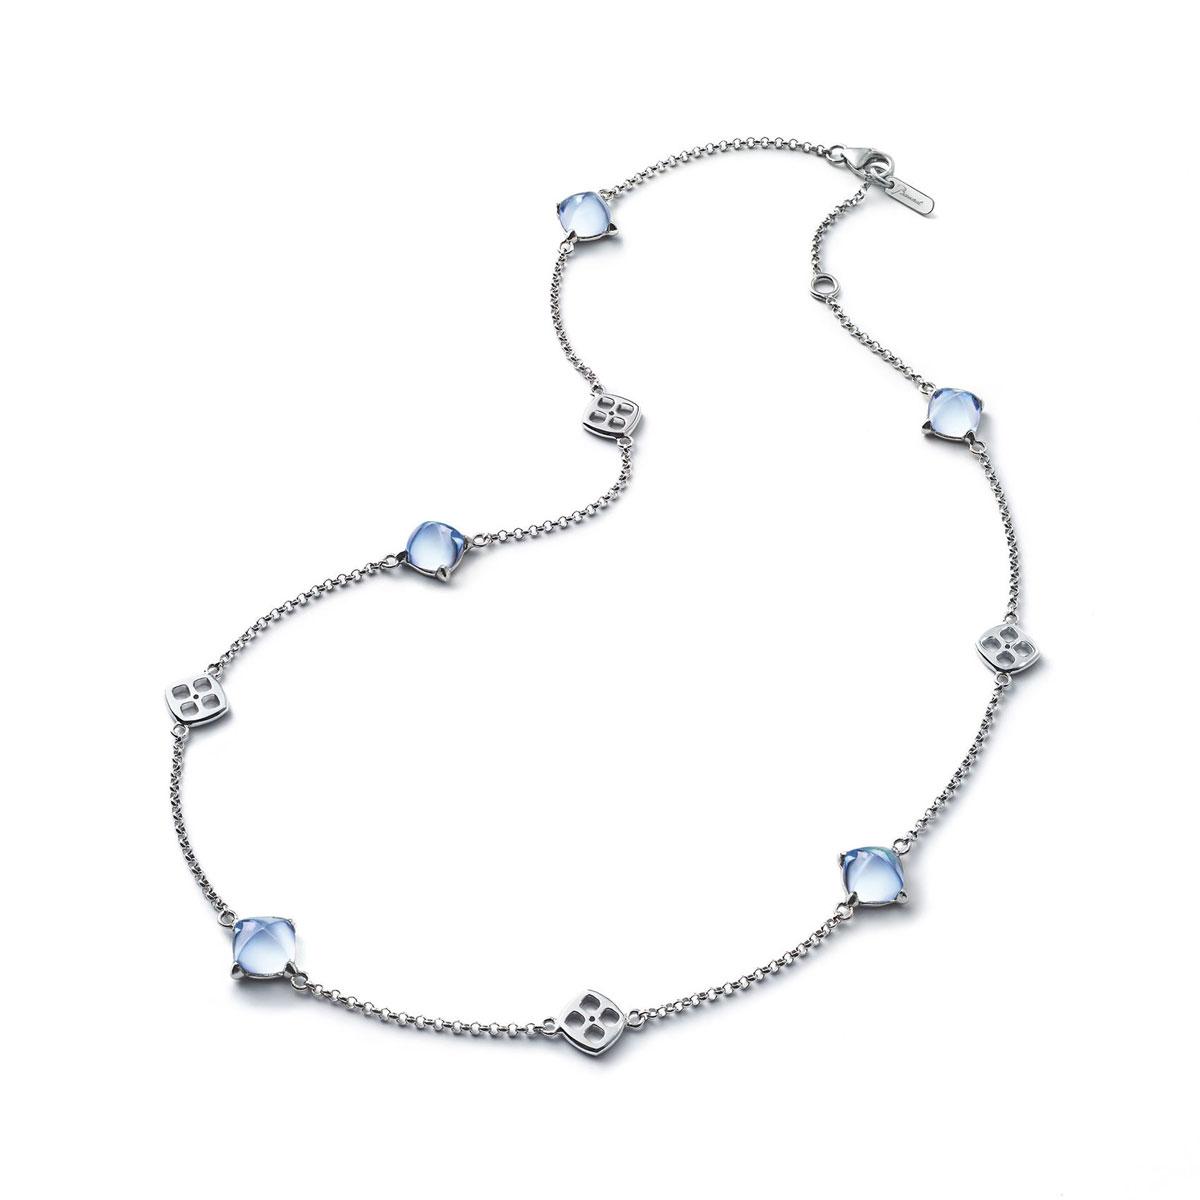 Baccarat Crystal Medicis Mini Necklace Sterling Silver Aqua